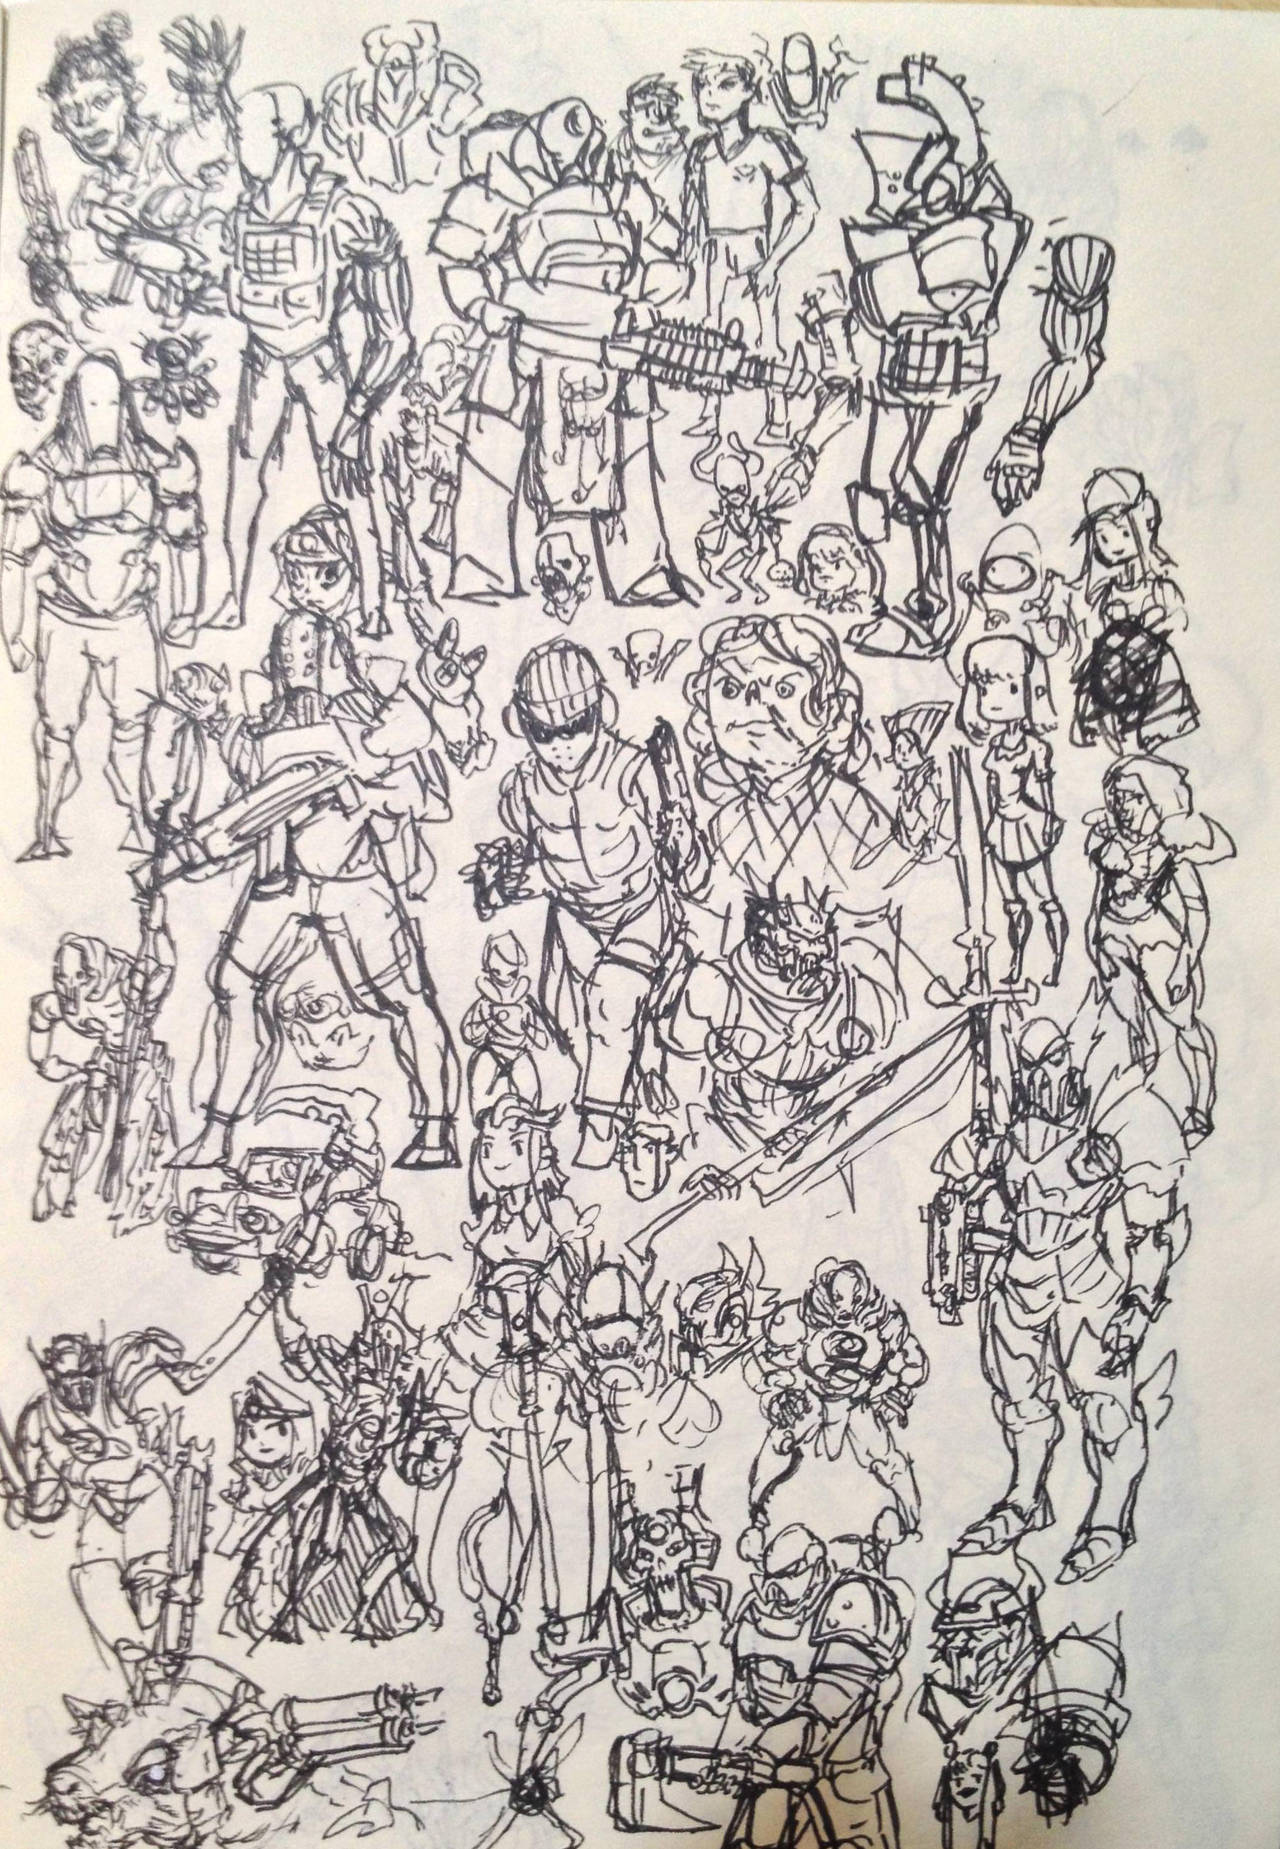 Sketch Dump by KidneyShake